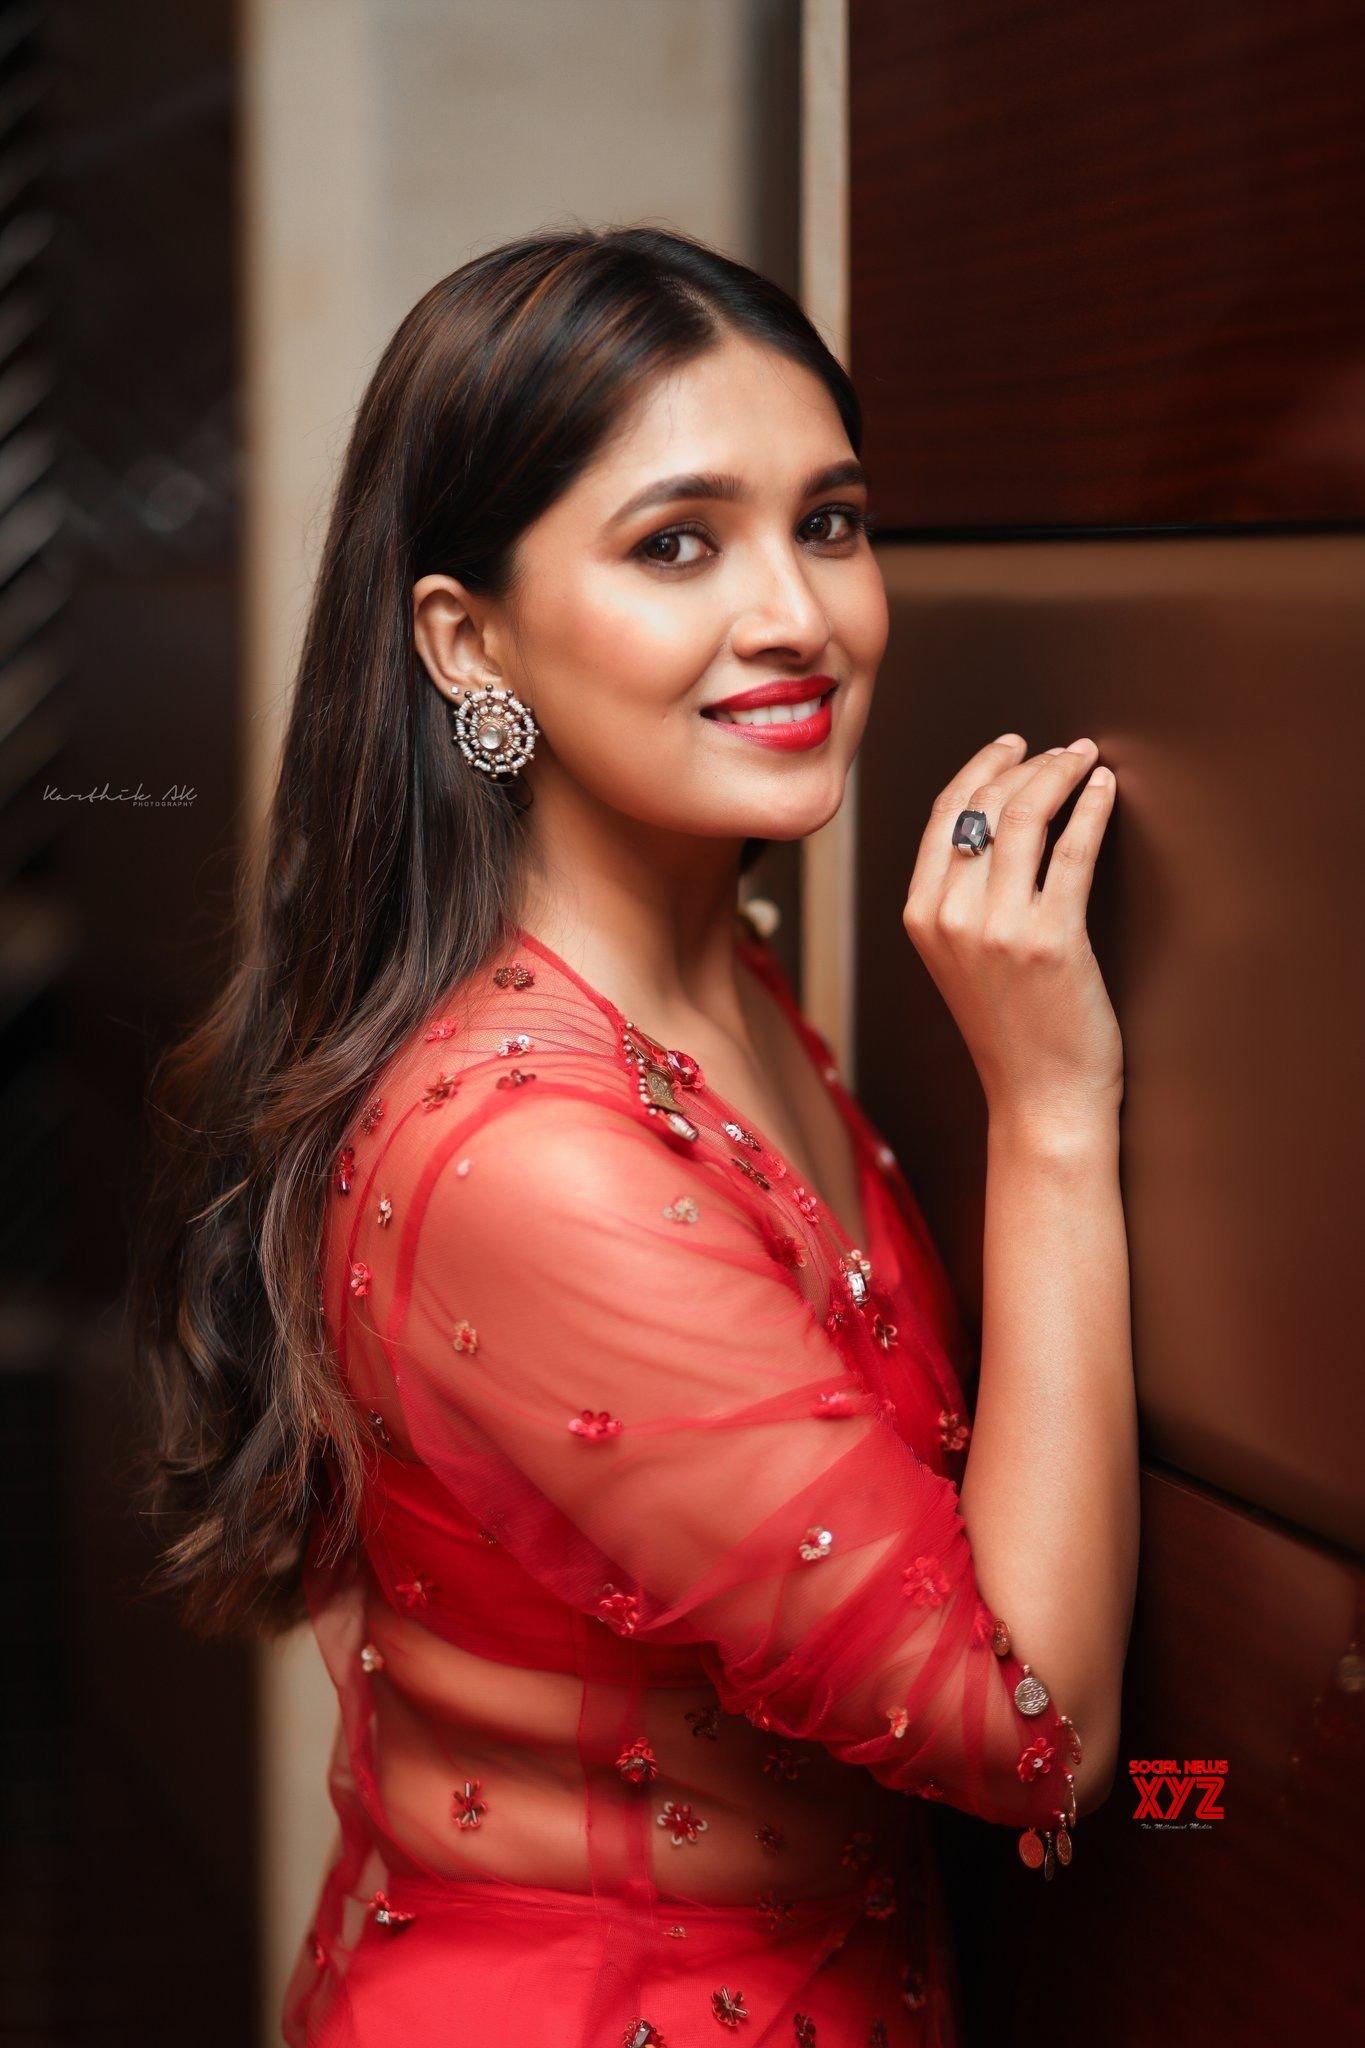 Actress Vani Bhojan Gorgeous New Photoshoot Stills